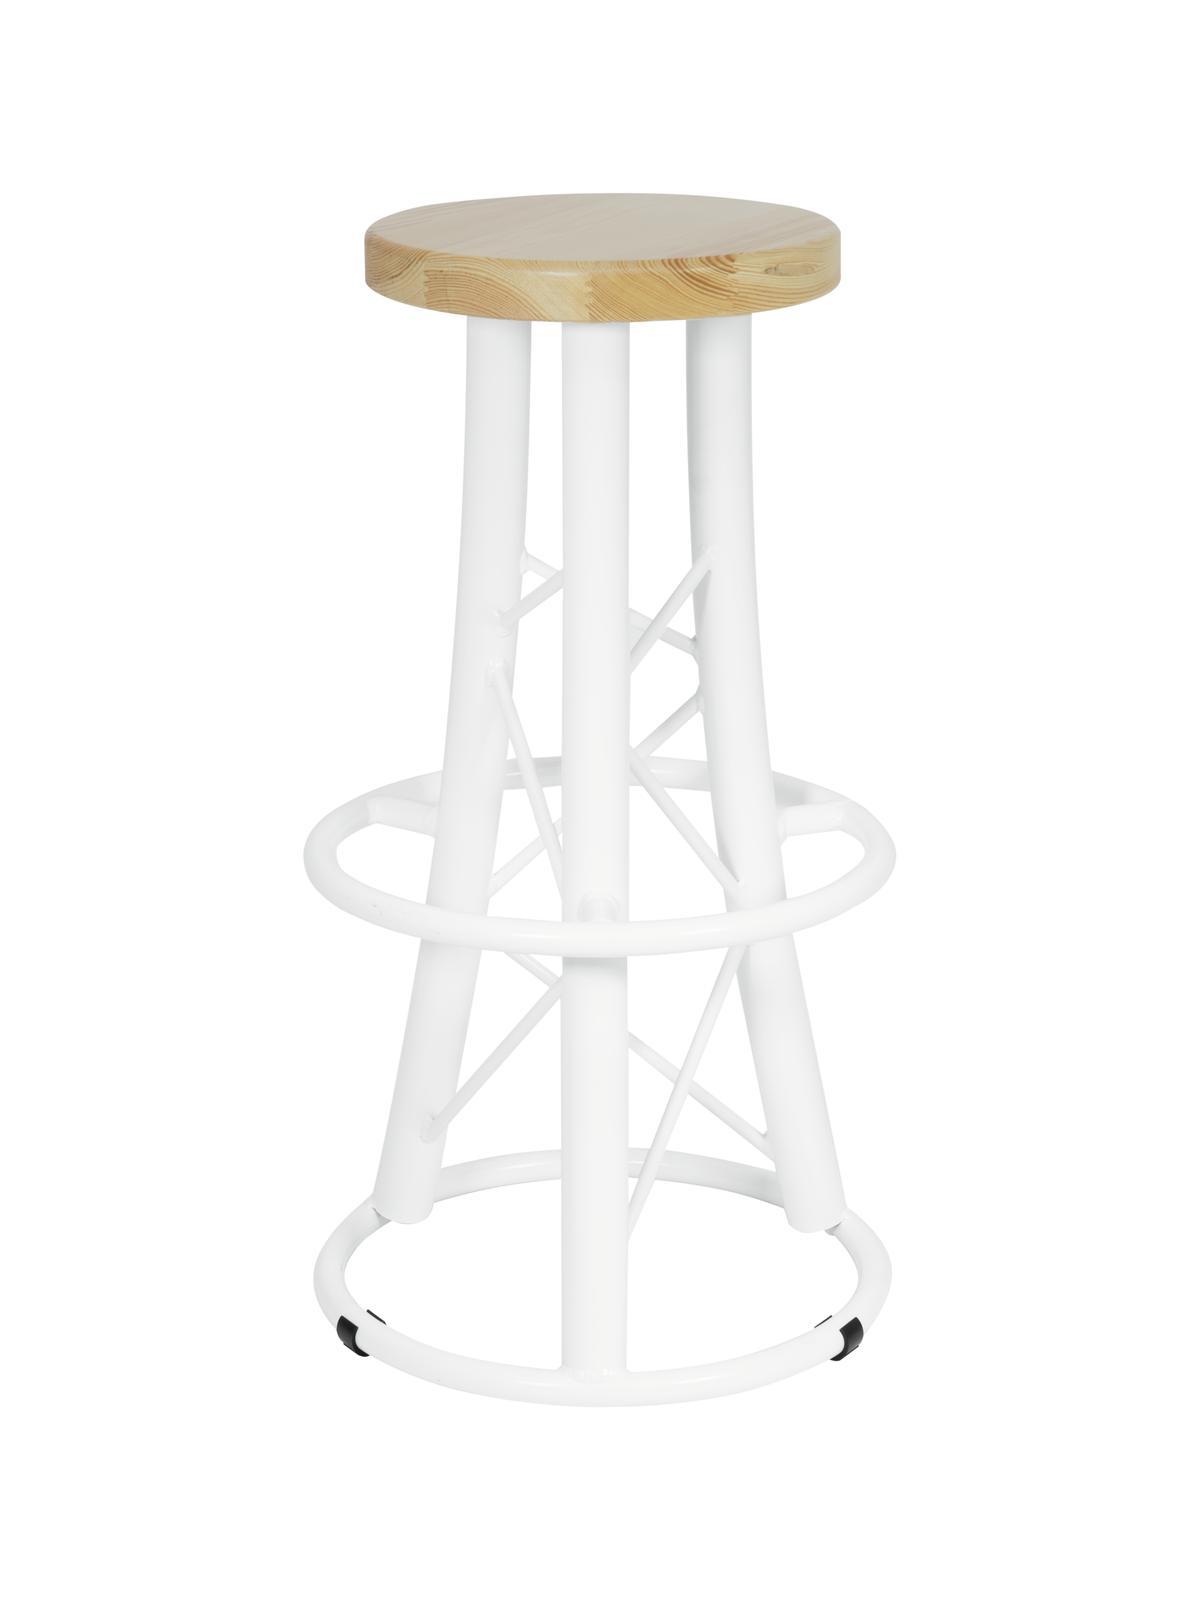 Stolička barová, 3-nožka prohnutá, bílá